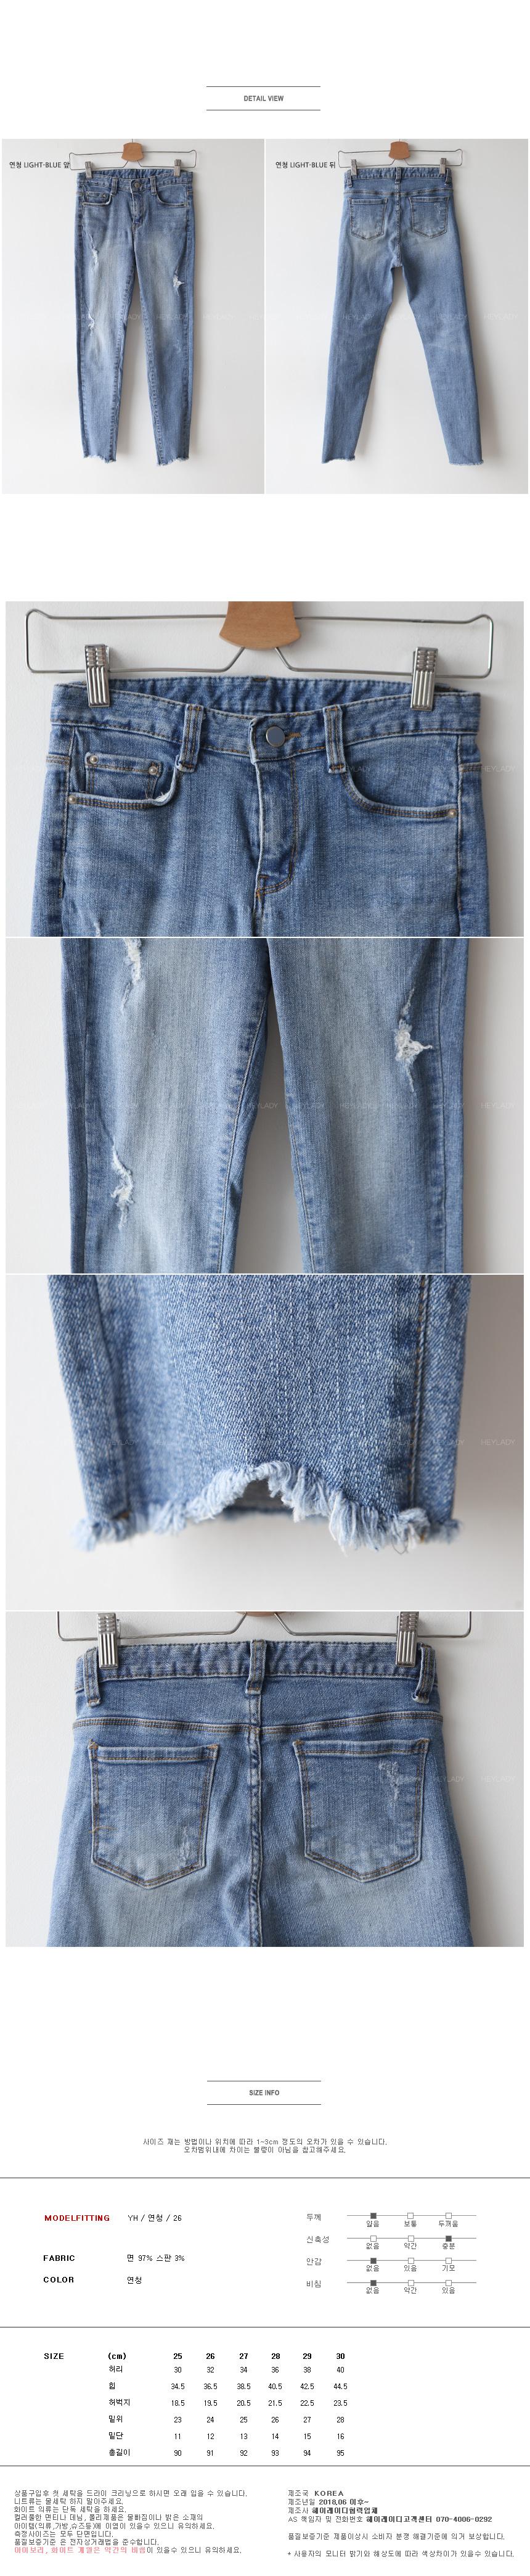 Town Surgery Skinny Pants